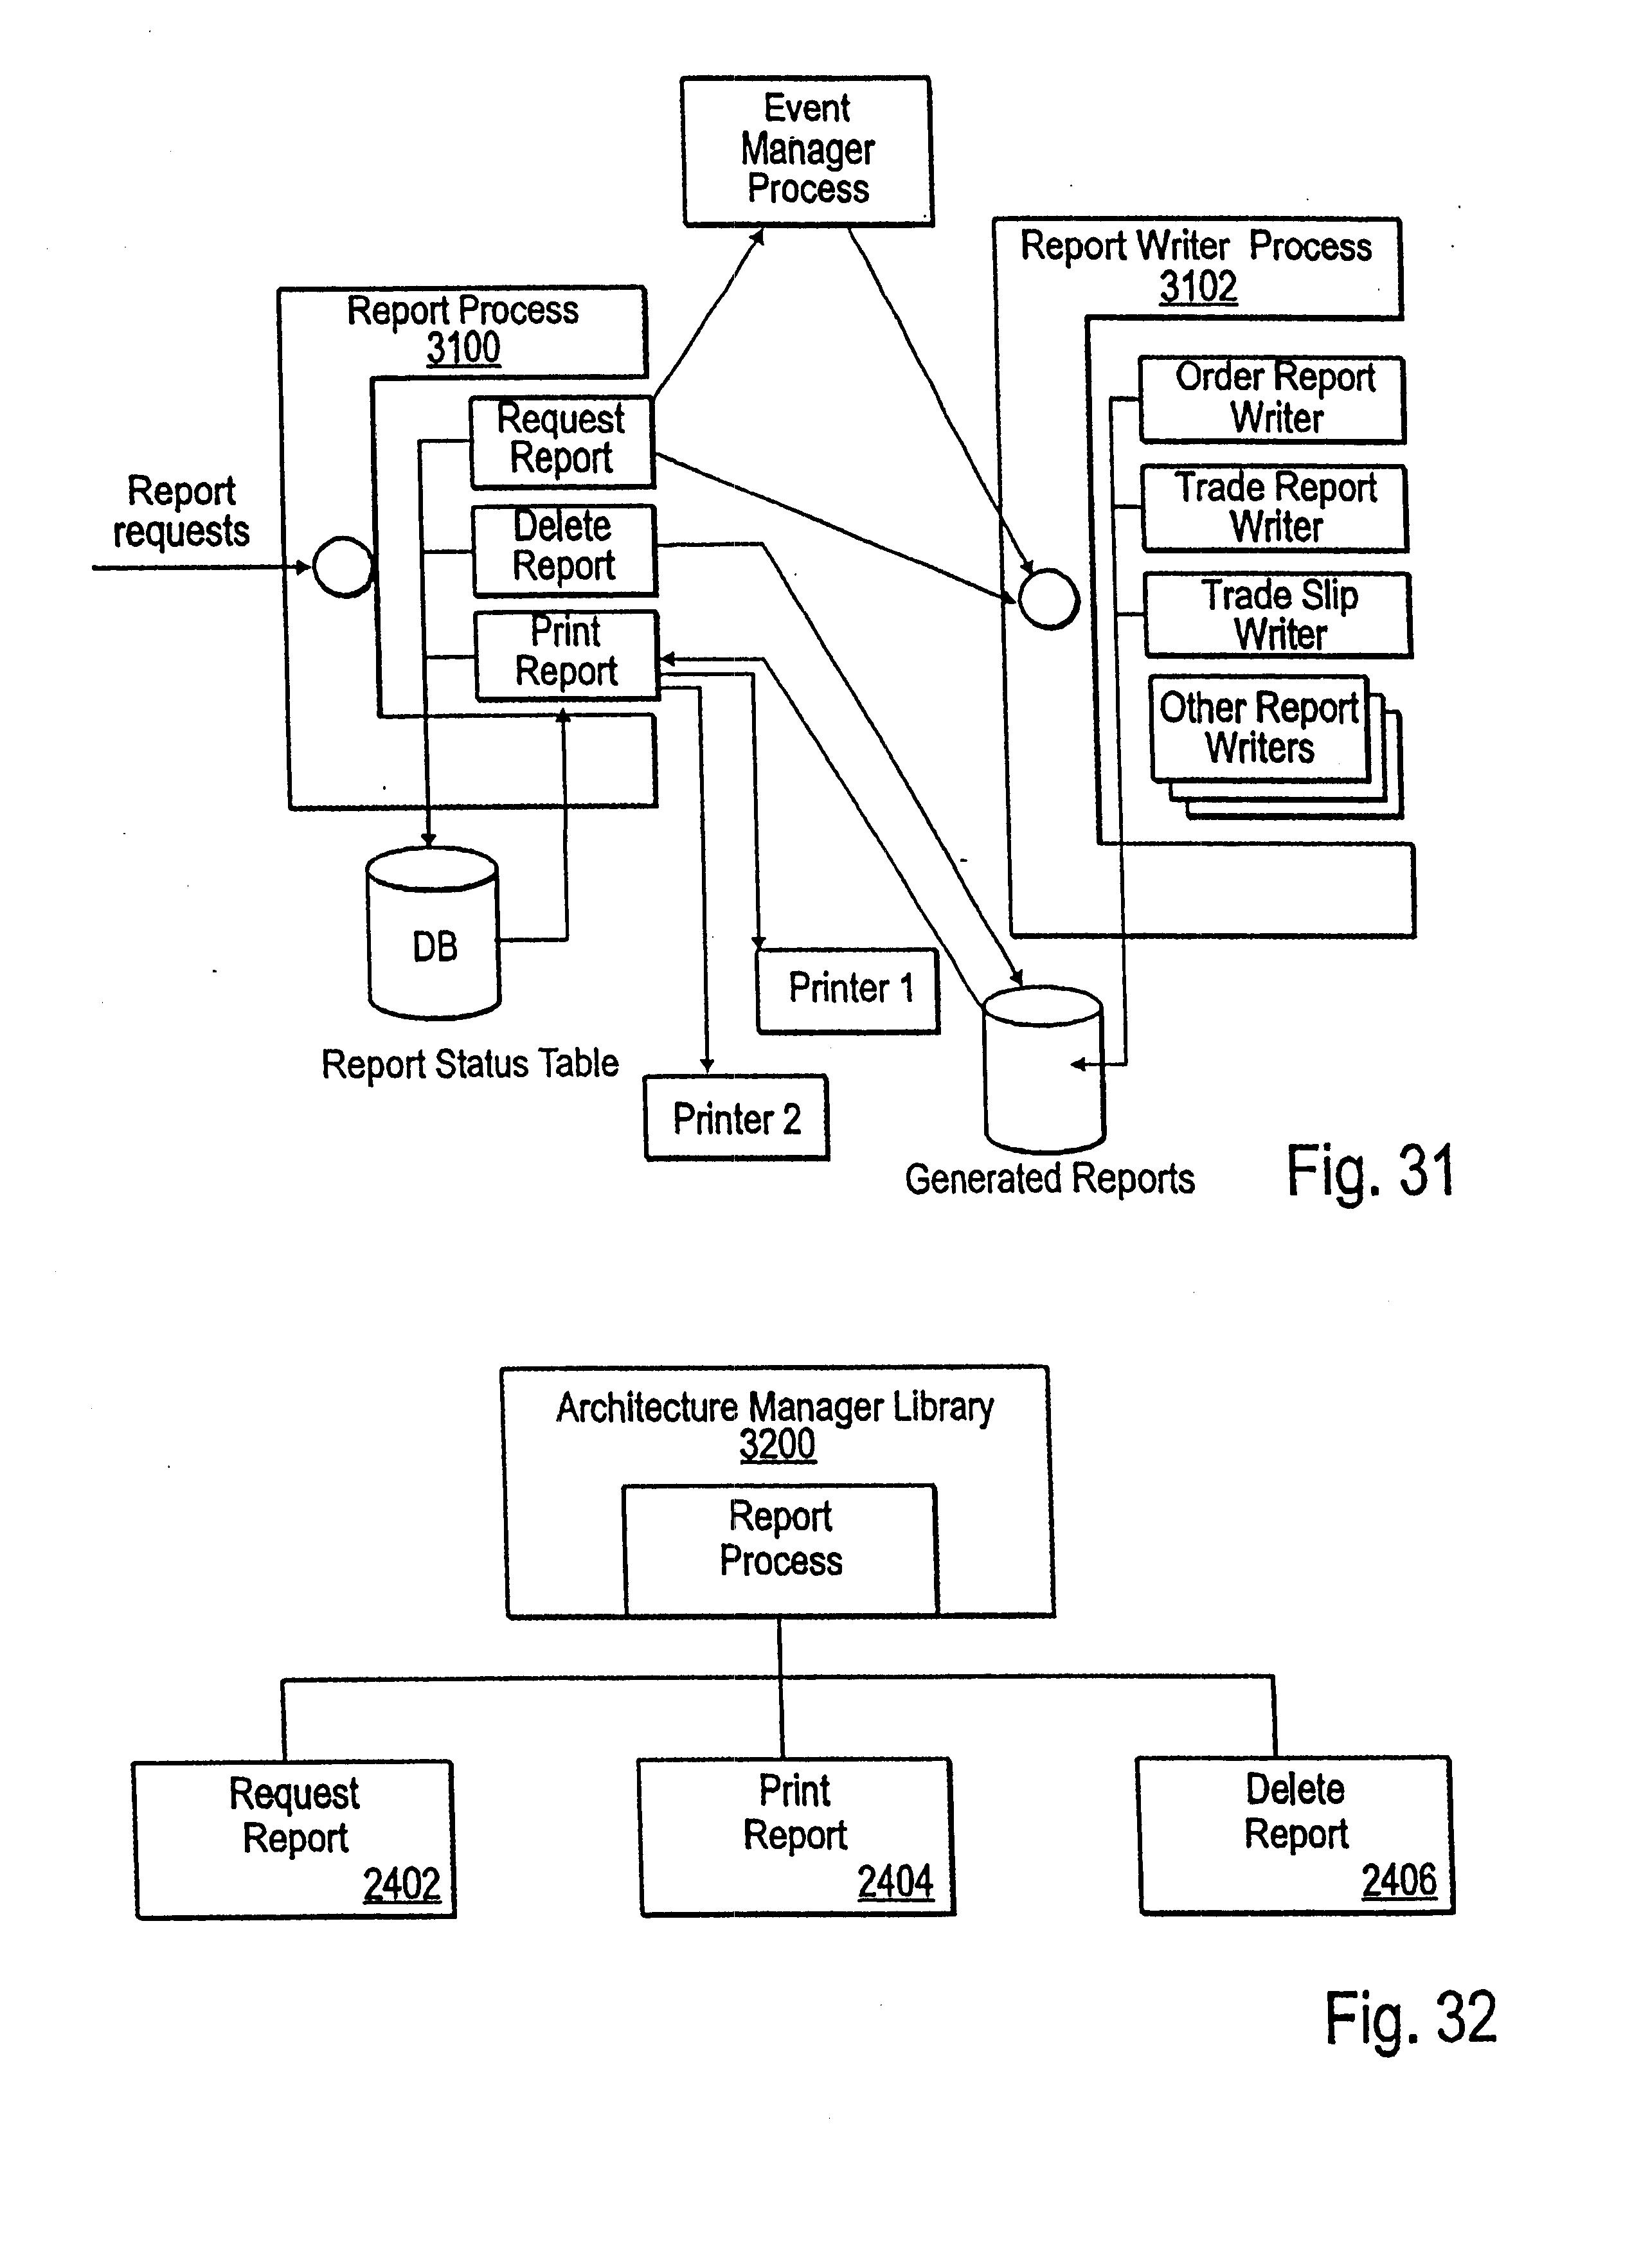 Patent US 6,477,580 B1